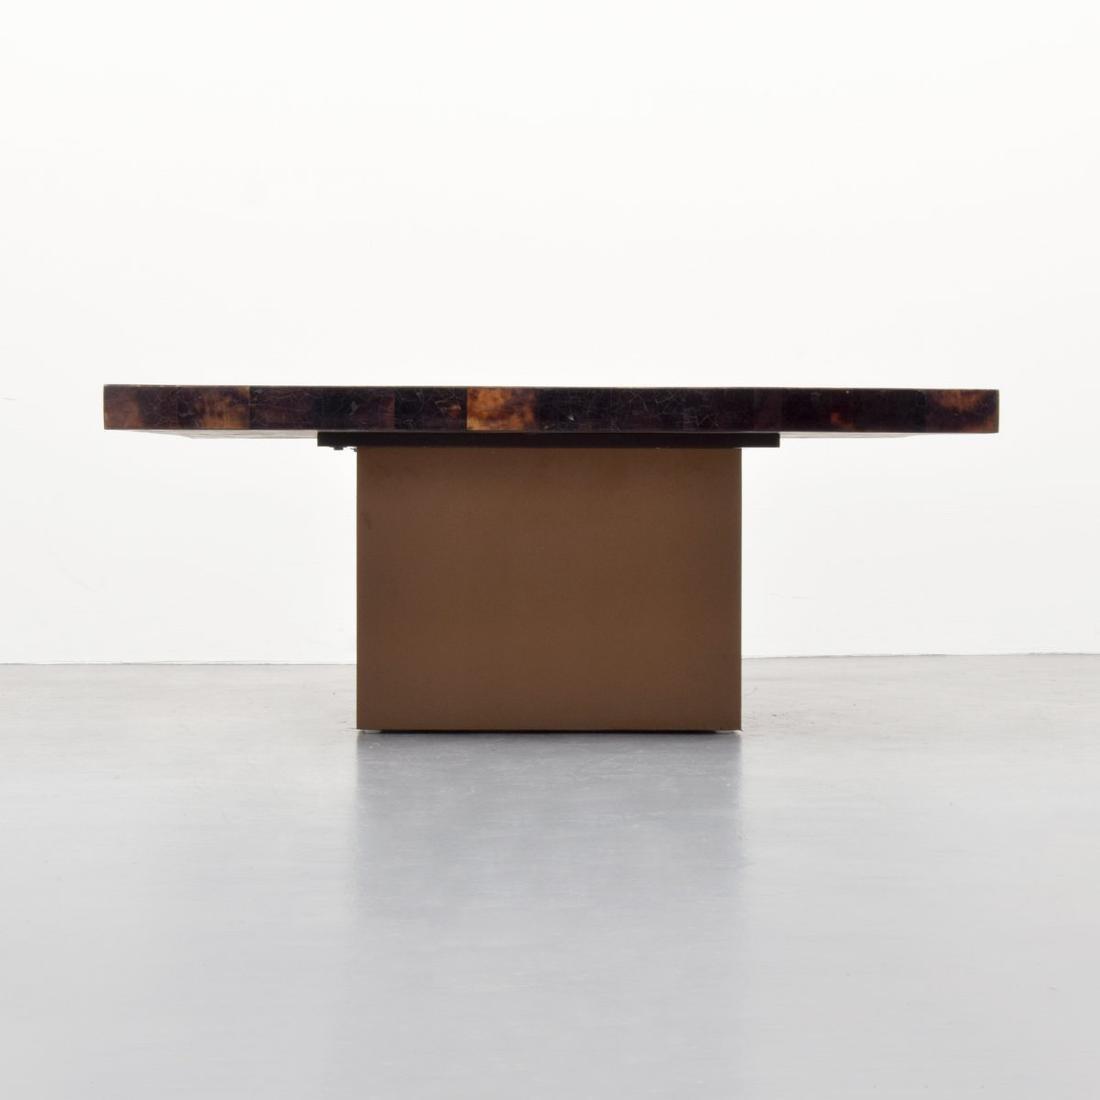 Horn Coffee Table, Manner of Karl Springer - 3